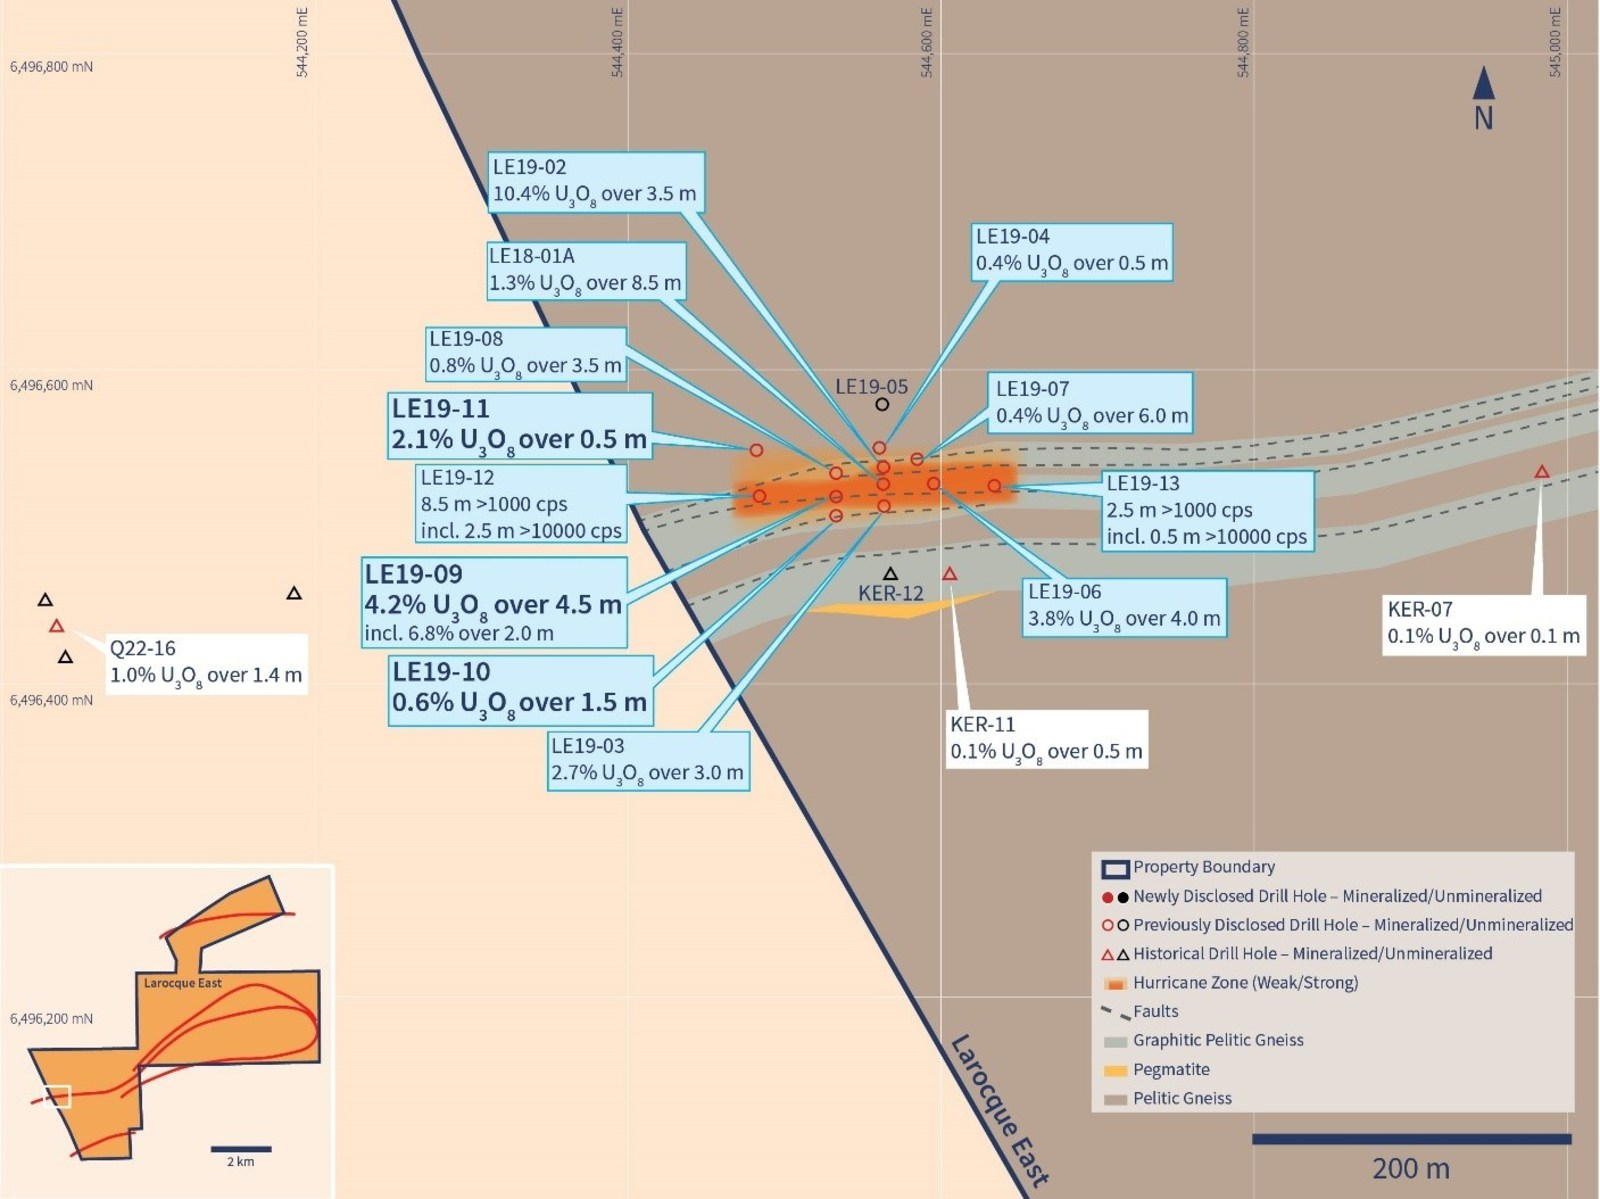 Figure 2 – Hurricane Zone Detailed Planview